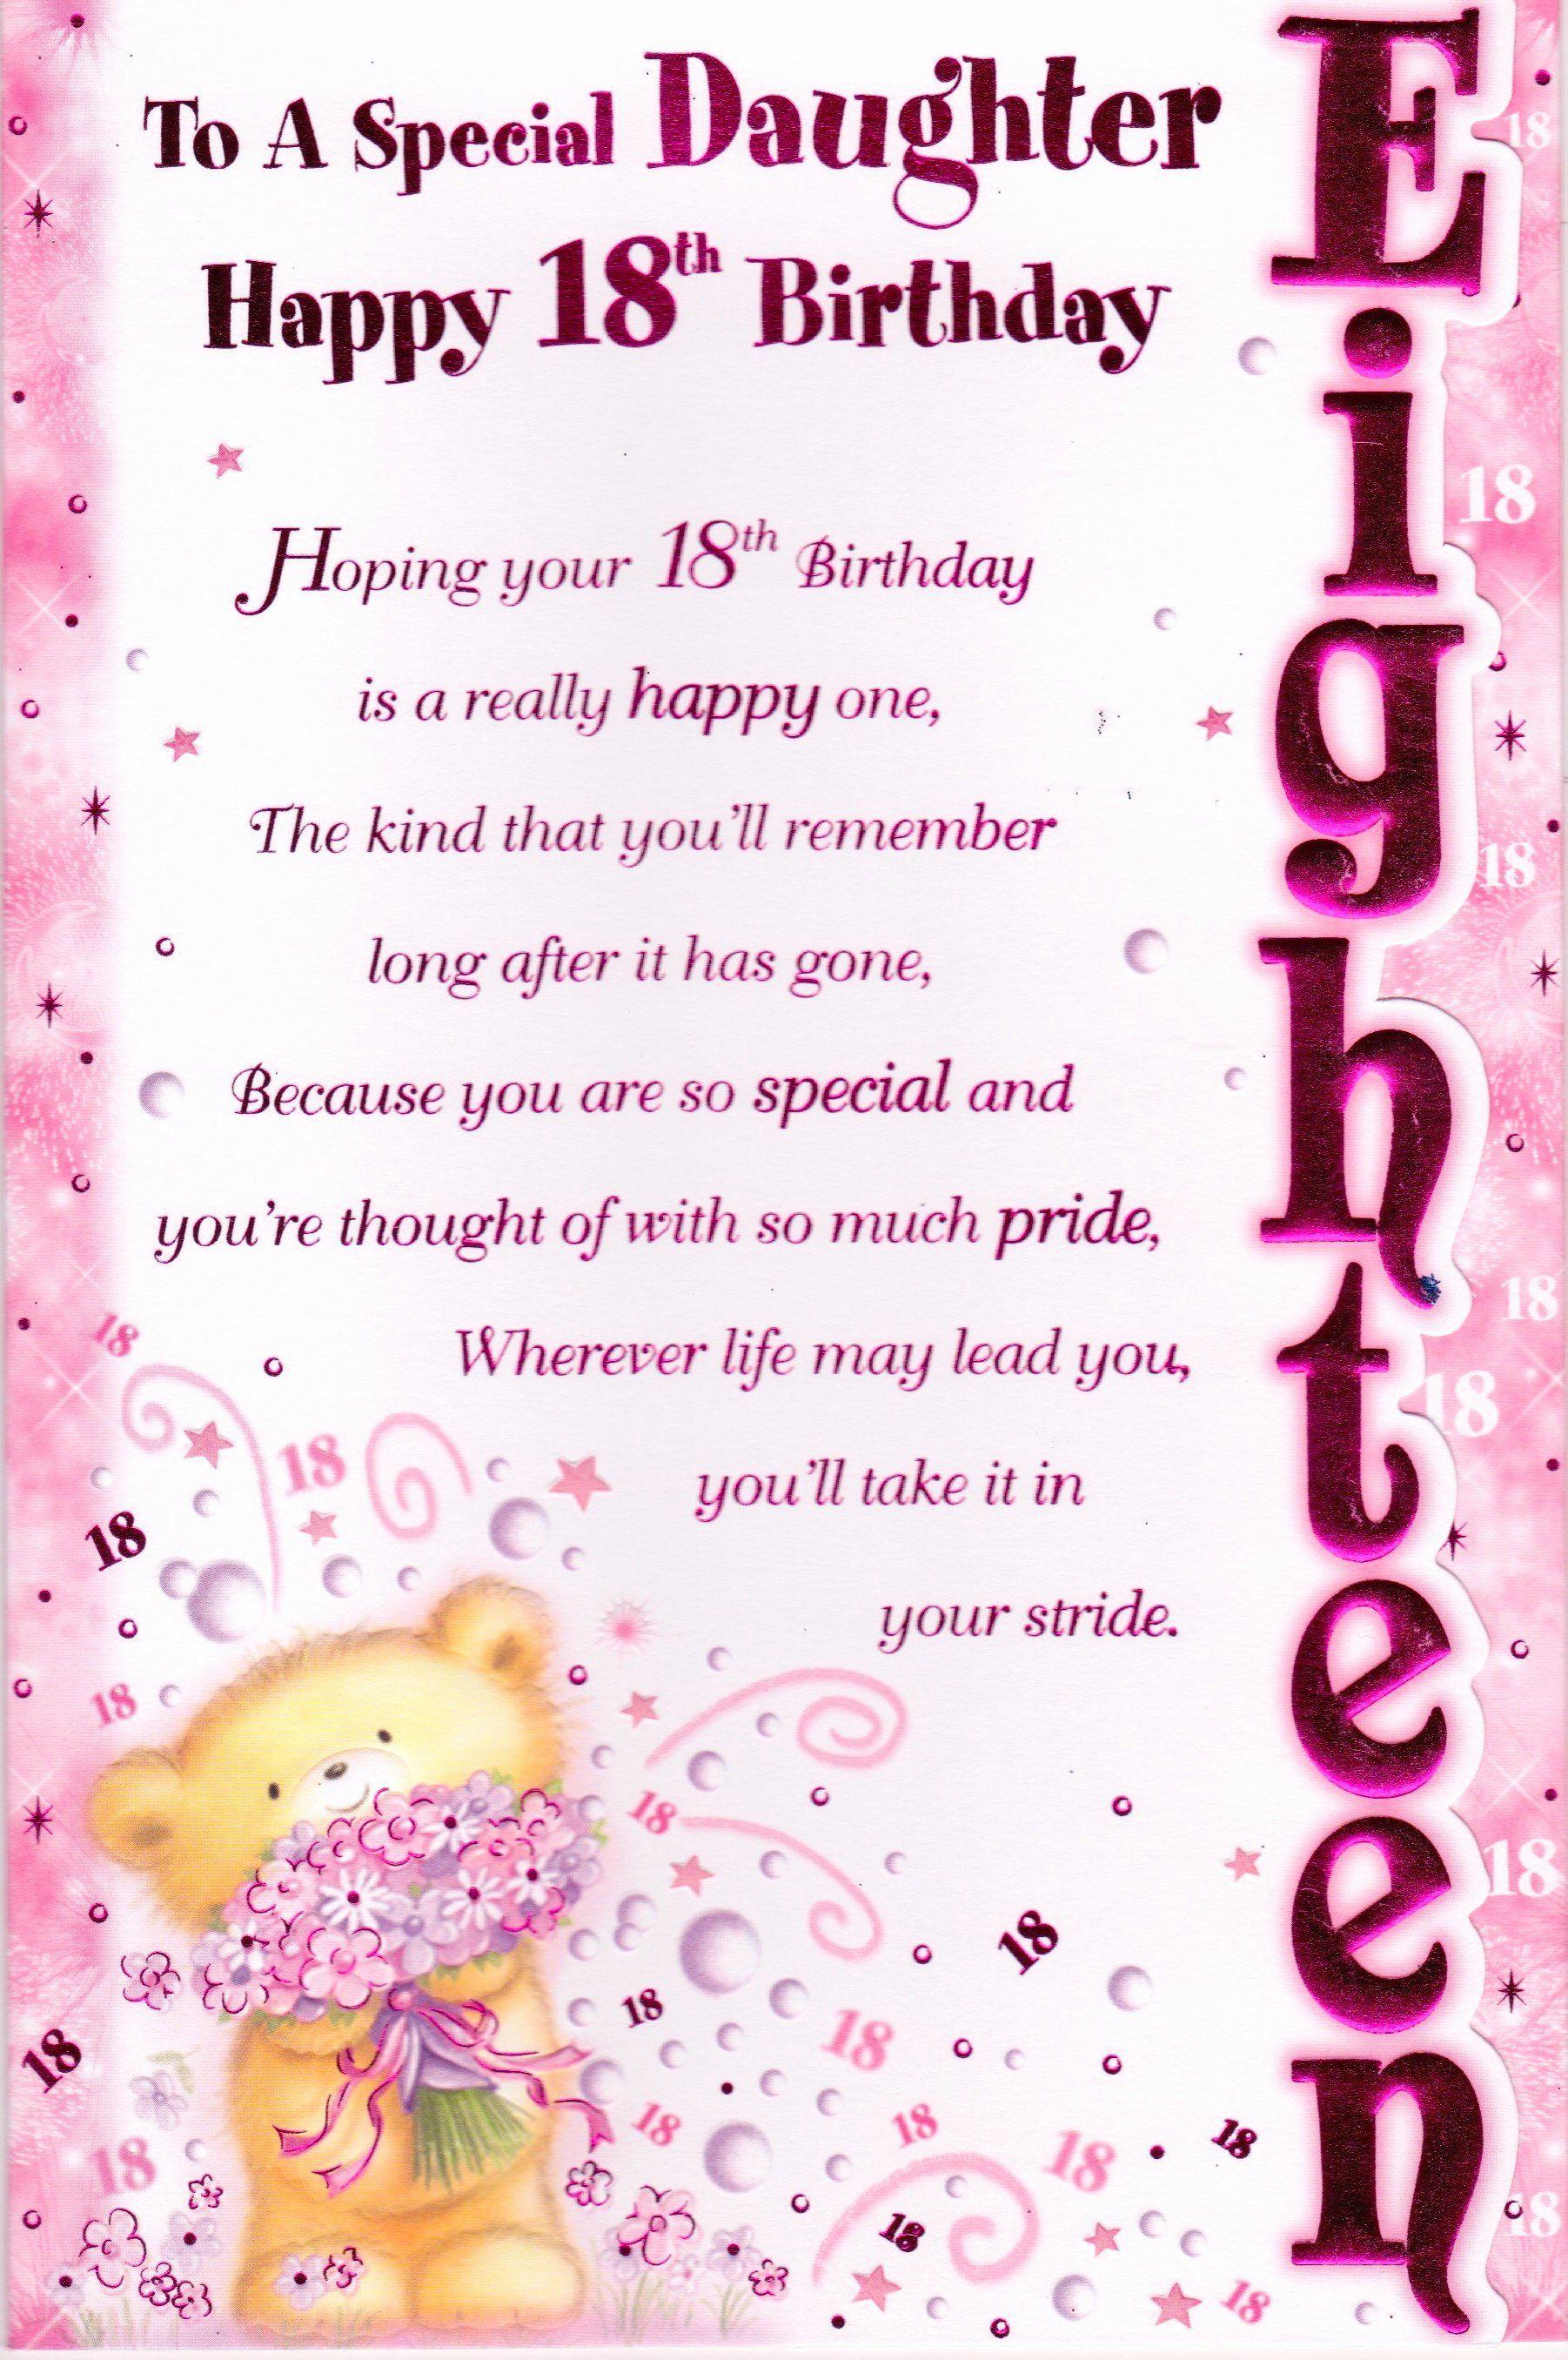 Pin By Yami Infante On Birthday Birthday Quotes Happy 18th Birthday Quotes Birthday Poems For Daughter